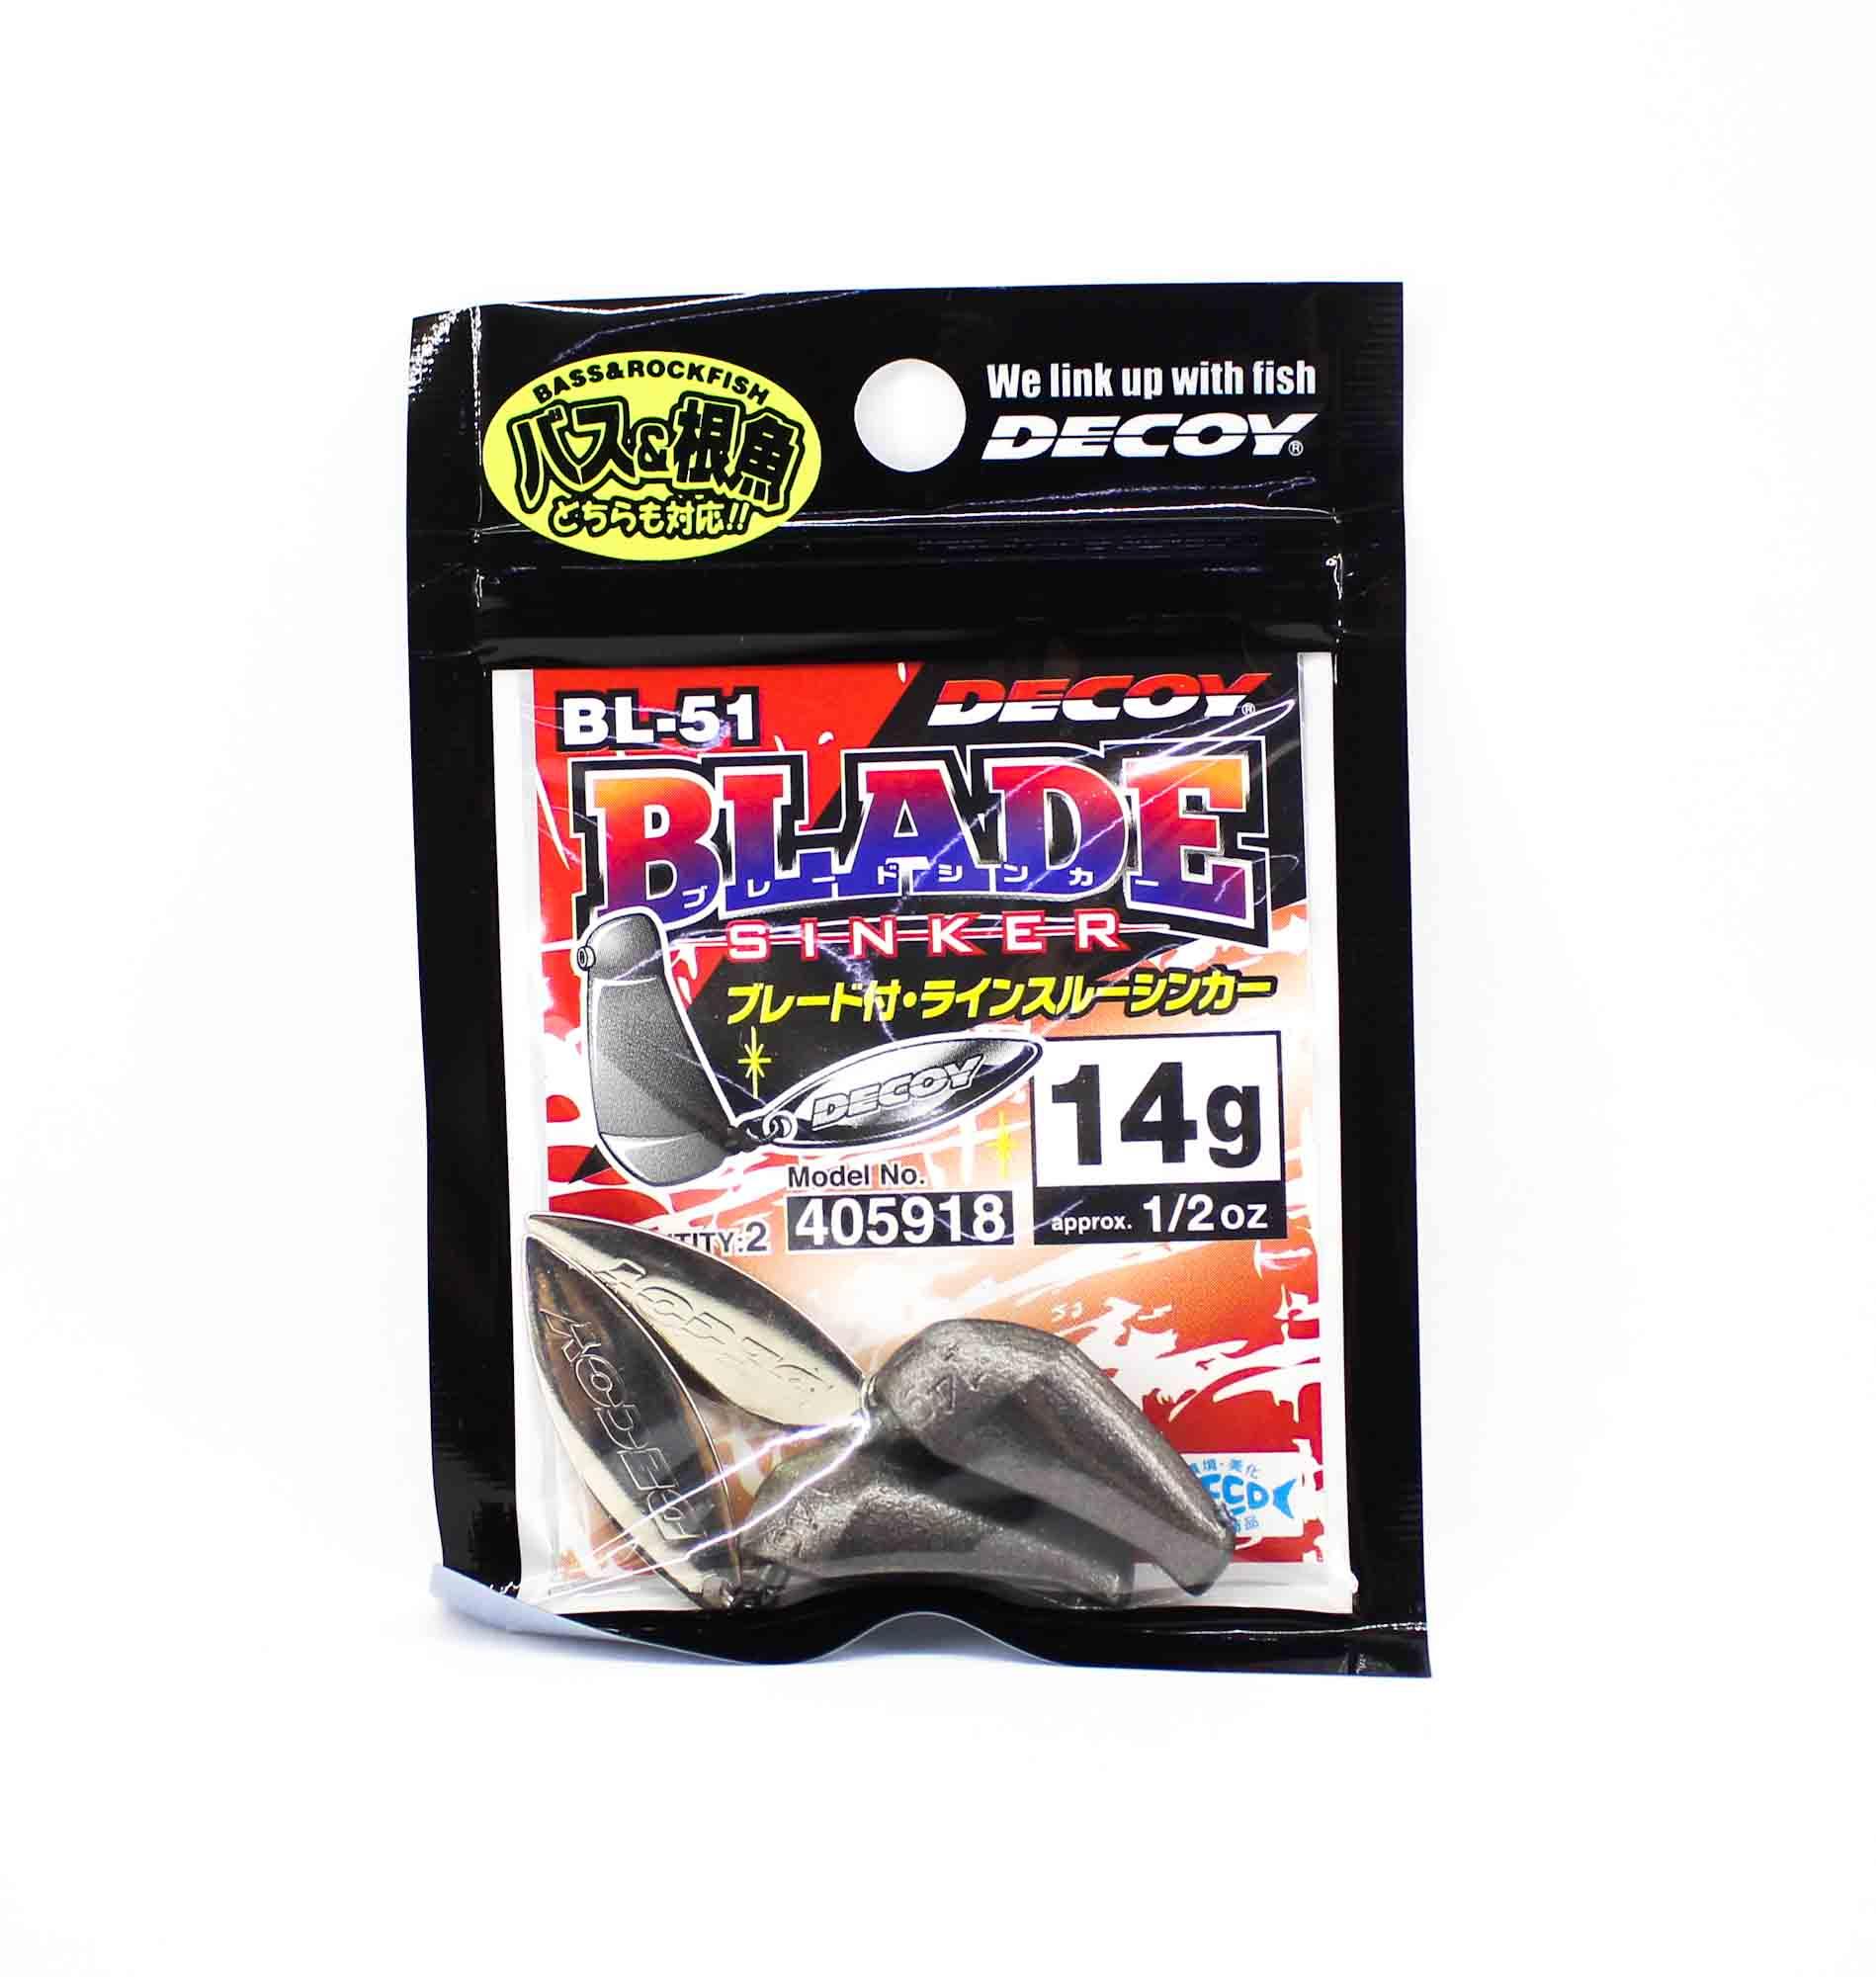 Decoy BL-51 Blade Sinker Size 14 grams (5918)